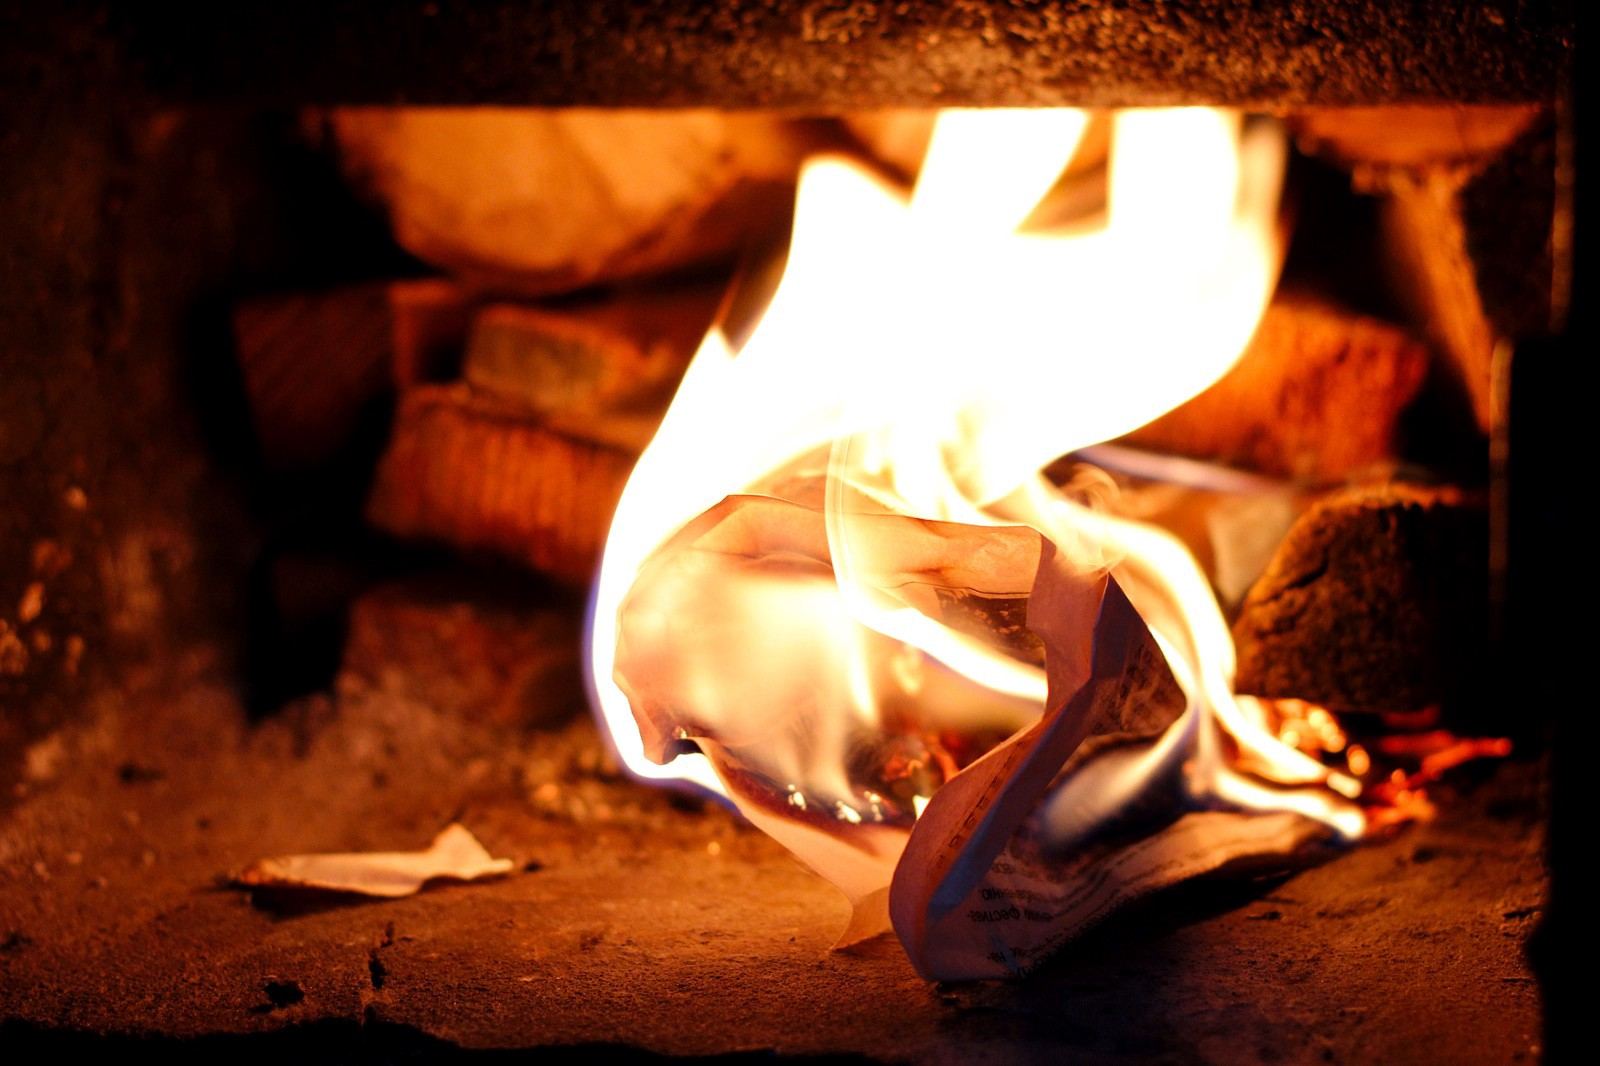 Binance Burns $9.4 Million Worth of BNB on its 6th Quarterly Coin Burn 13